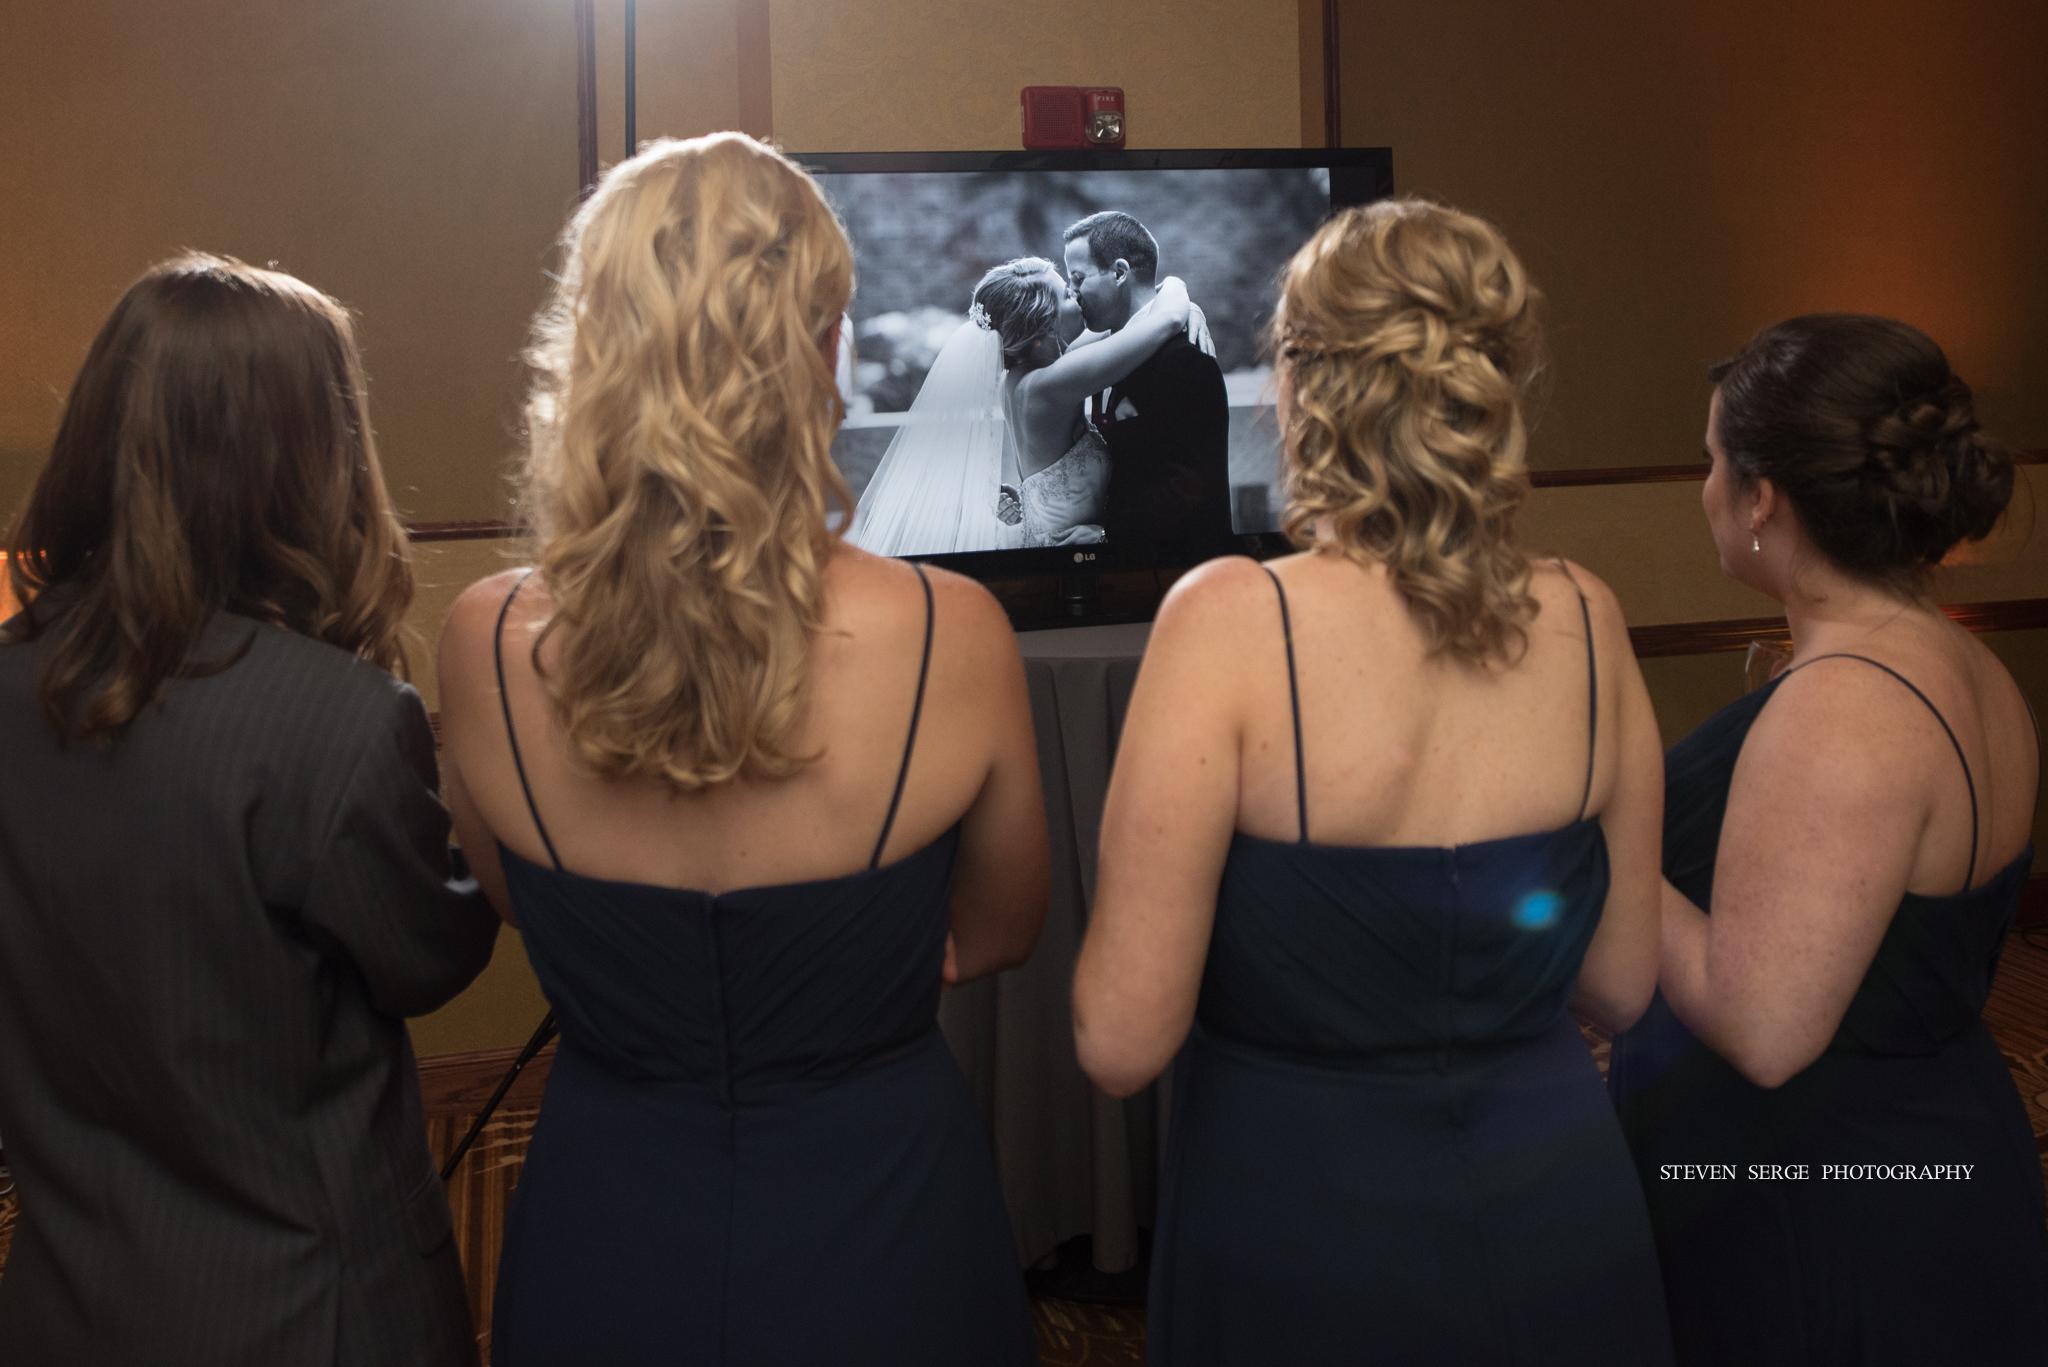 scranton-wedding-photographers-hilton-steven-serge-photography-23.jpg